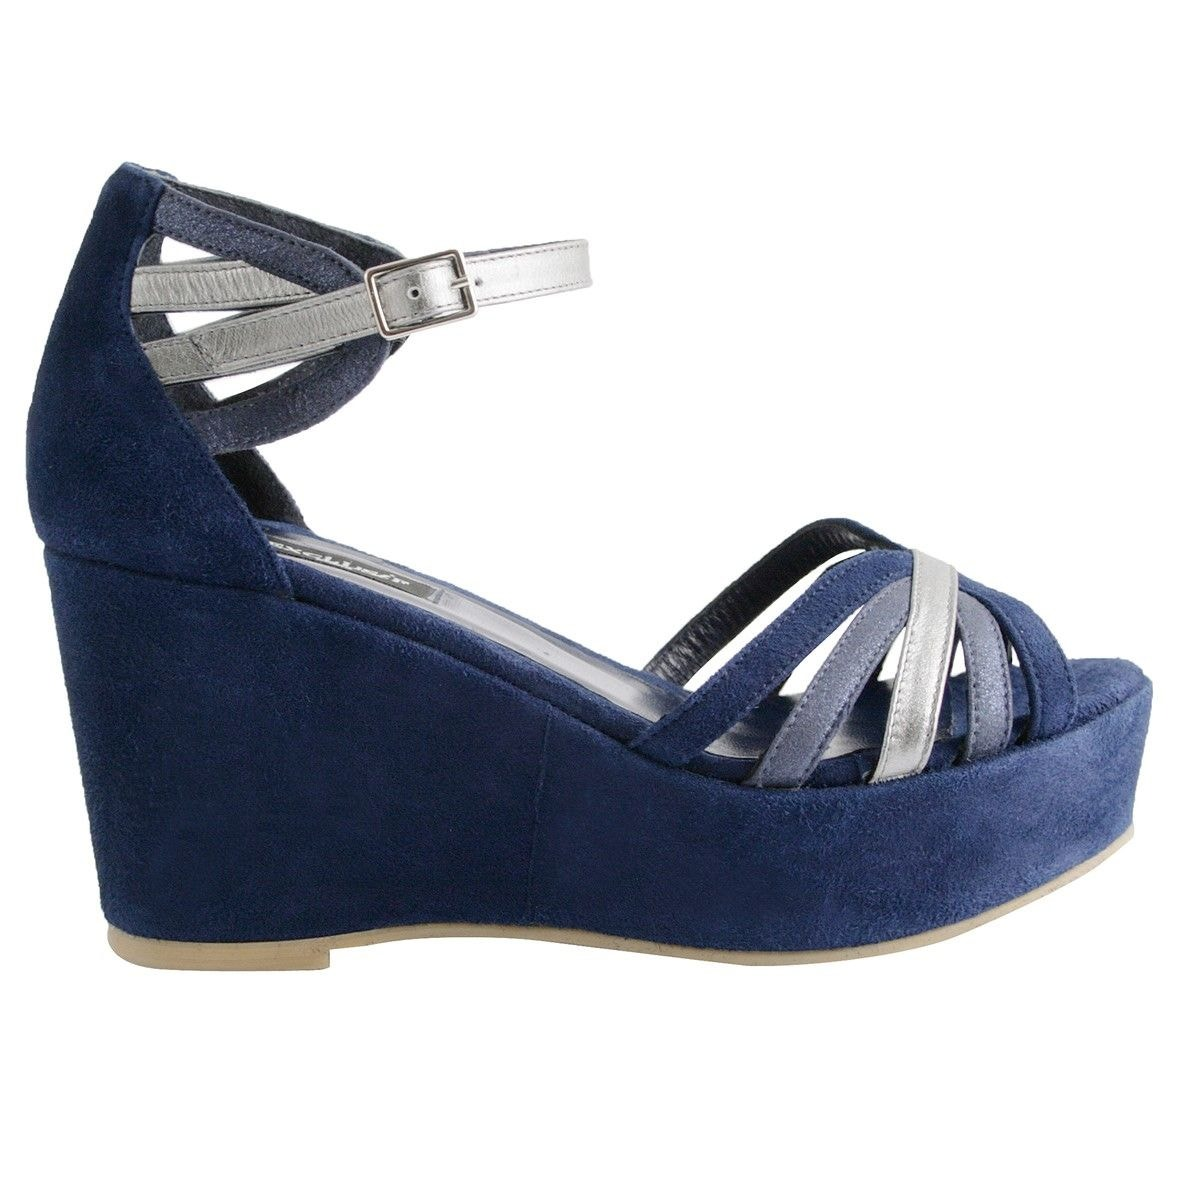 Chaussures compenséesLa Redoute